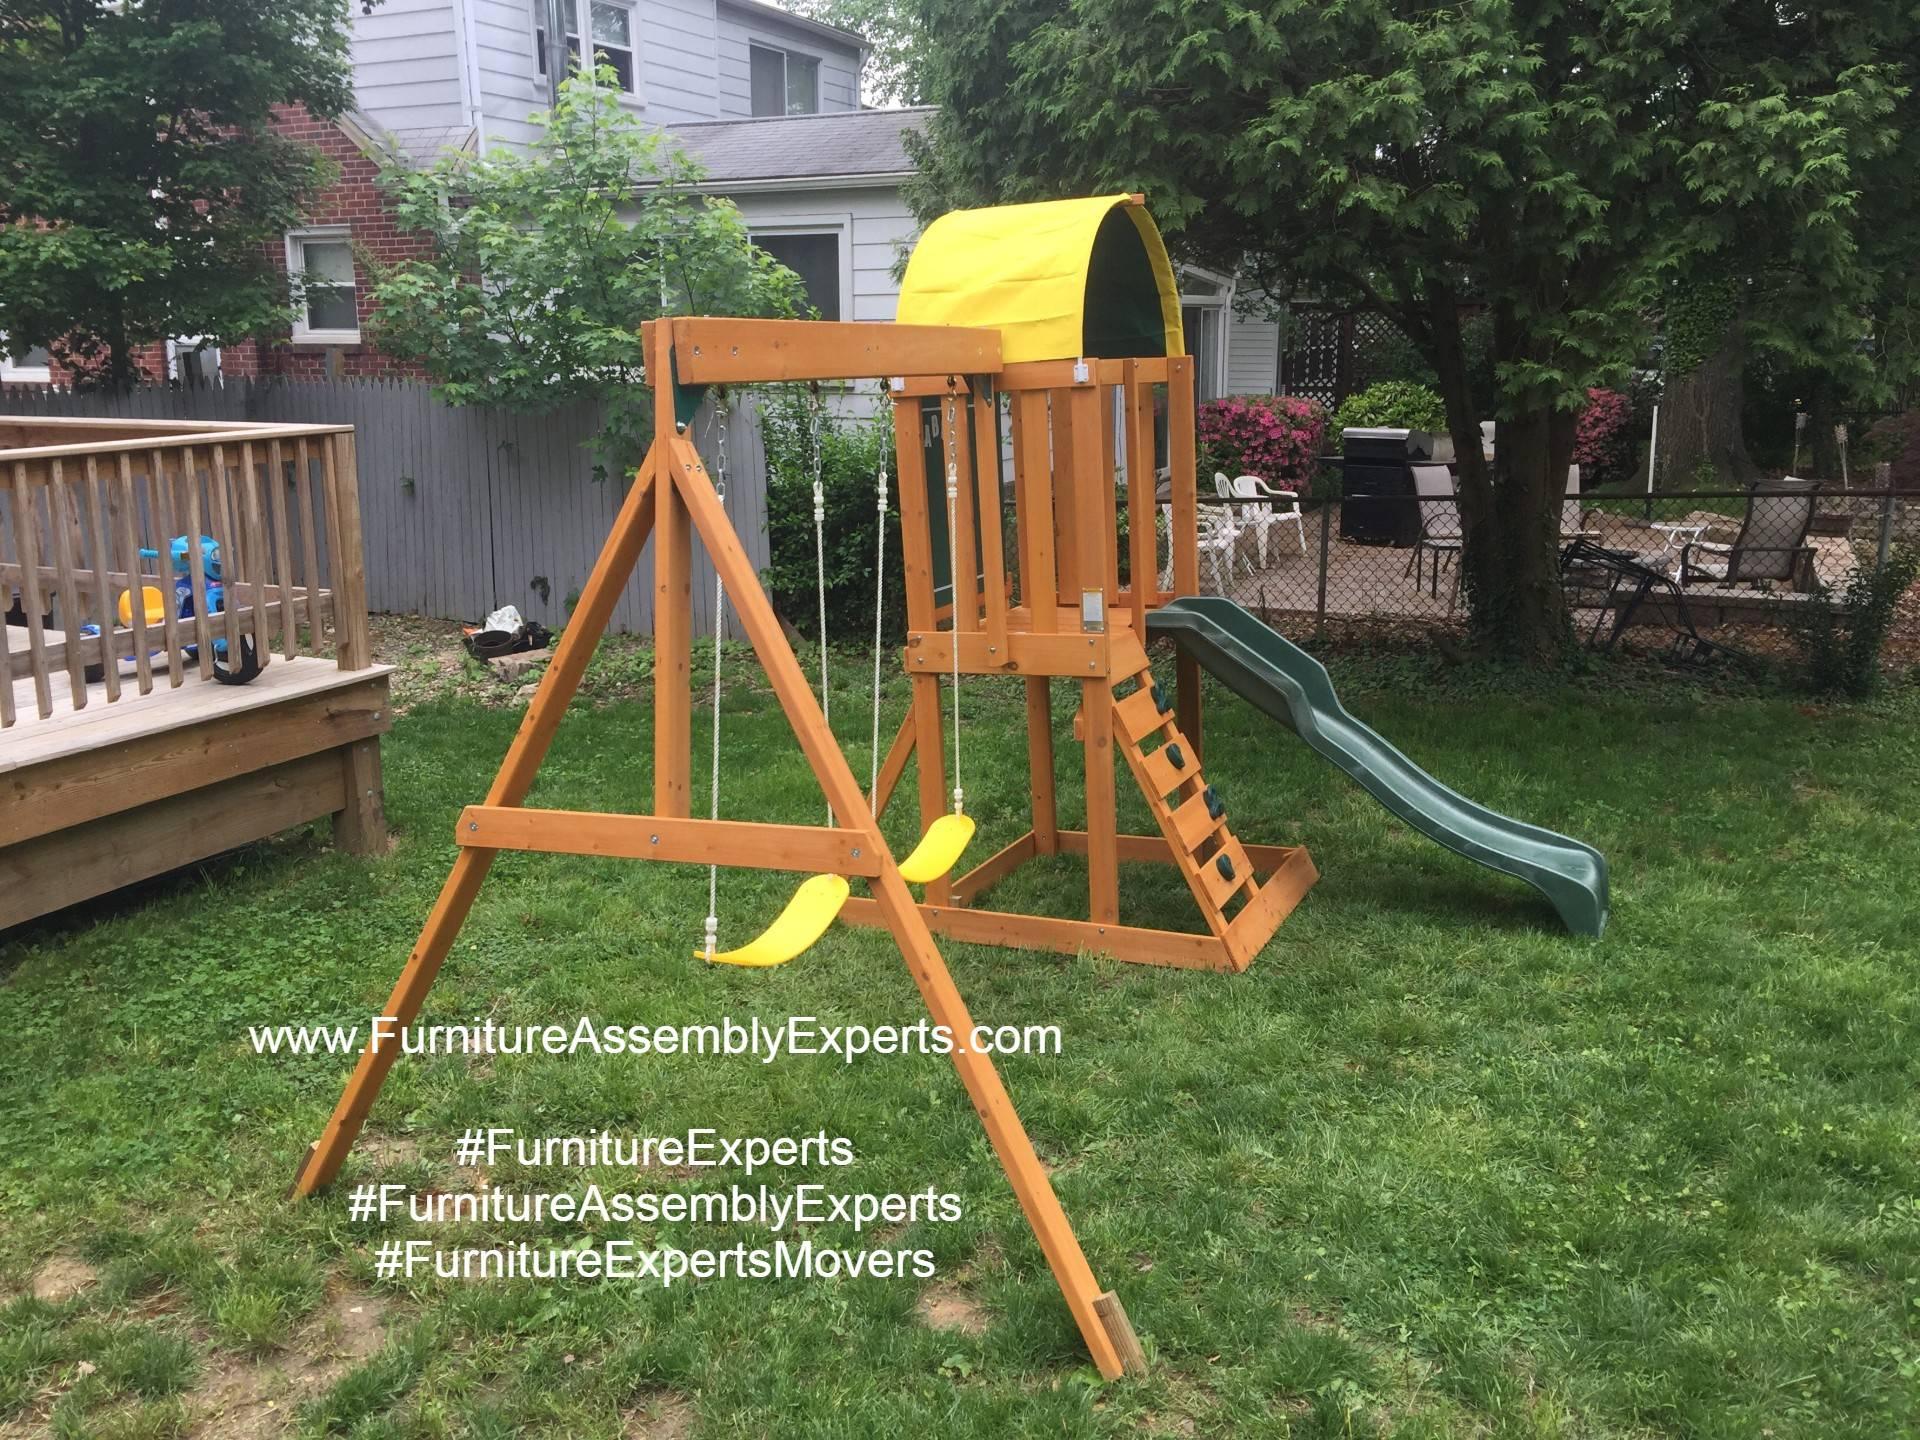 swing set installers in hanover MD